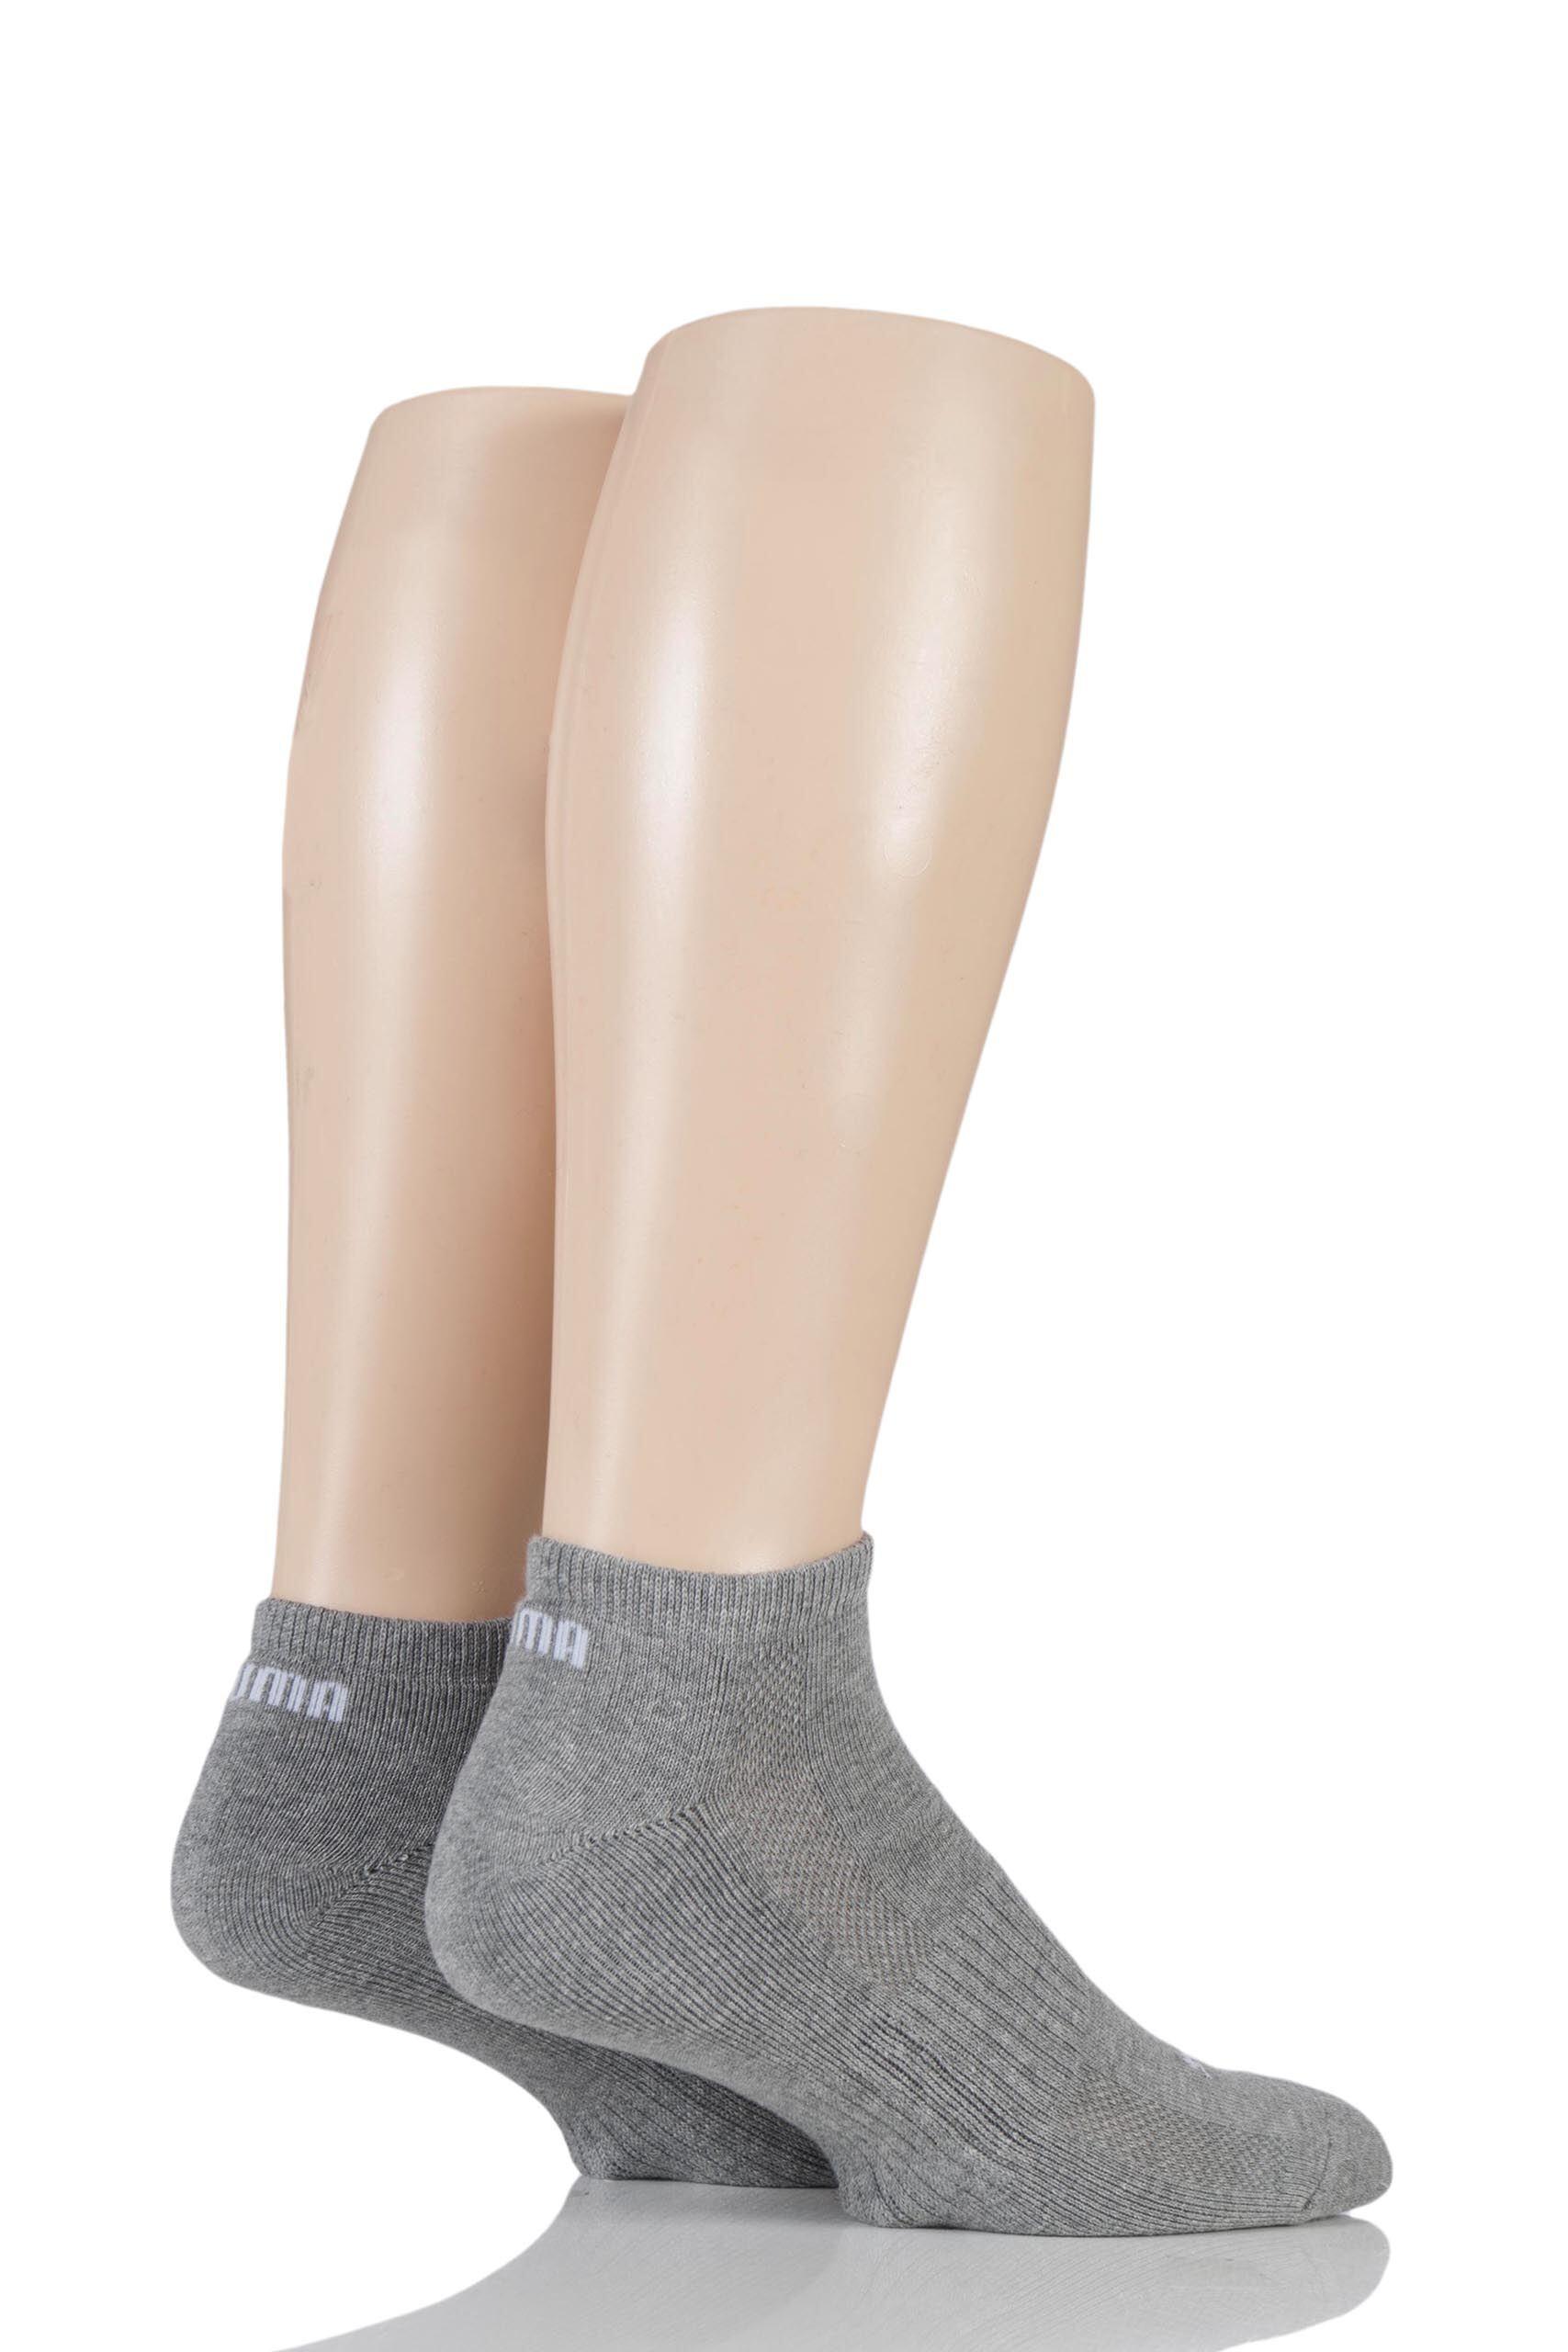 Image of 2 Pair Grey Sneaker Socks Unisex 2.5-5 Unisex - Puma